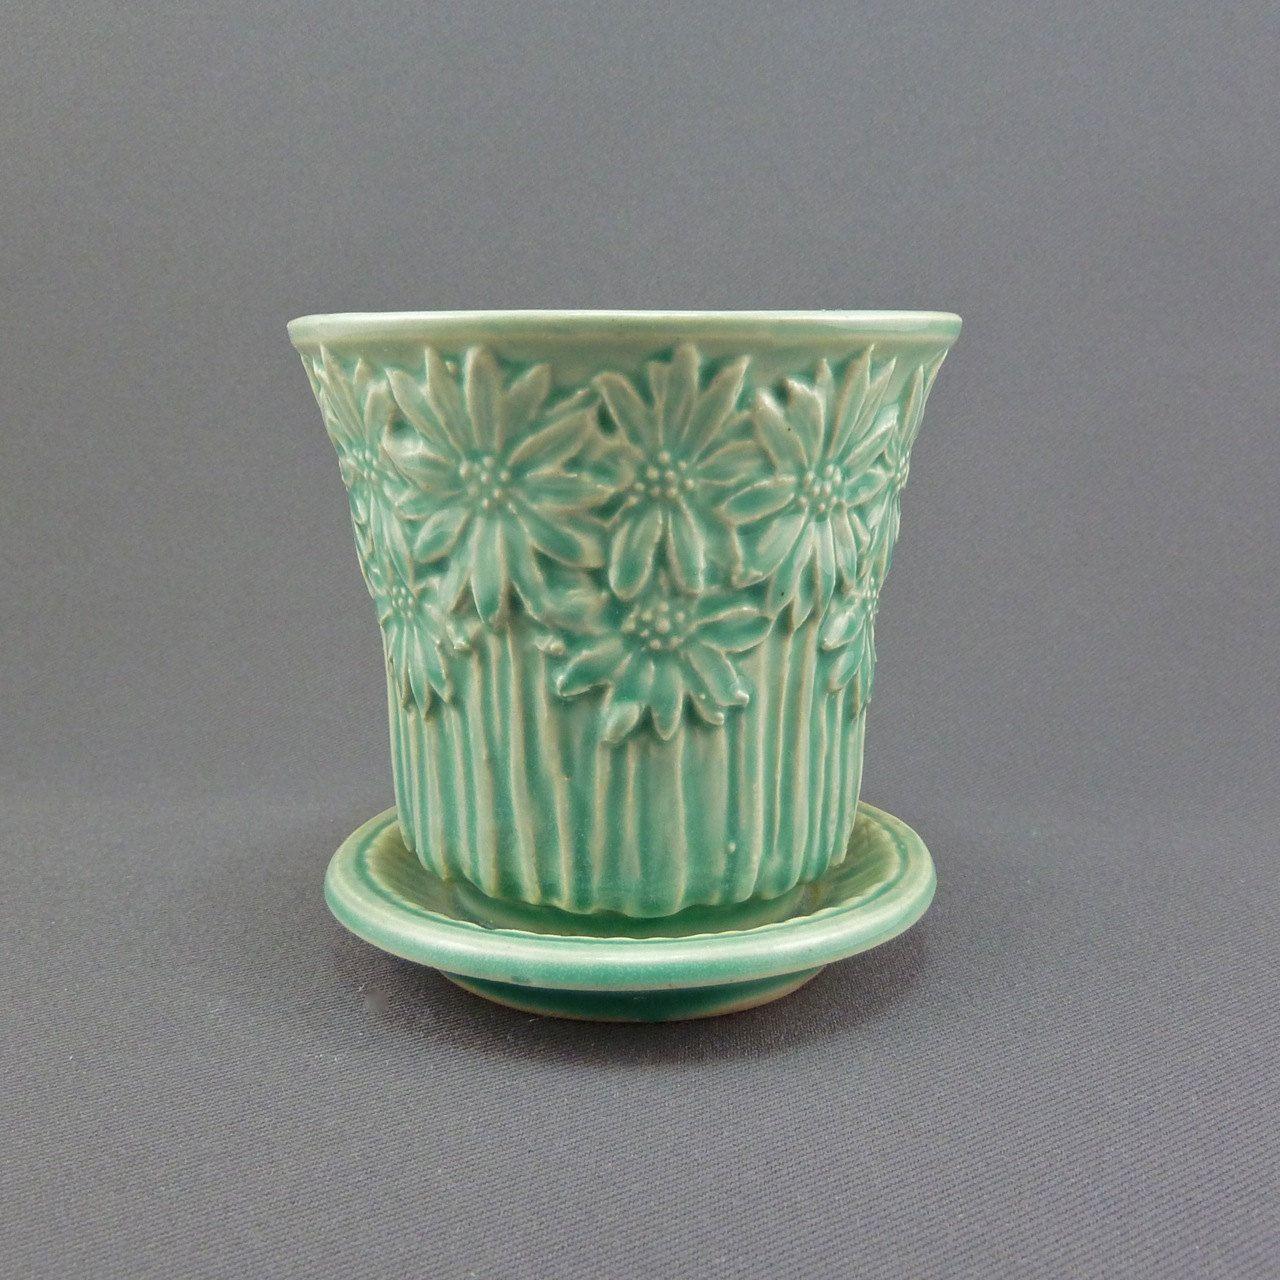 Image Detail For -Darling McCoy Pottery Planter / Plant